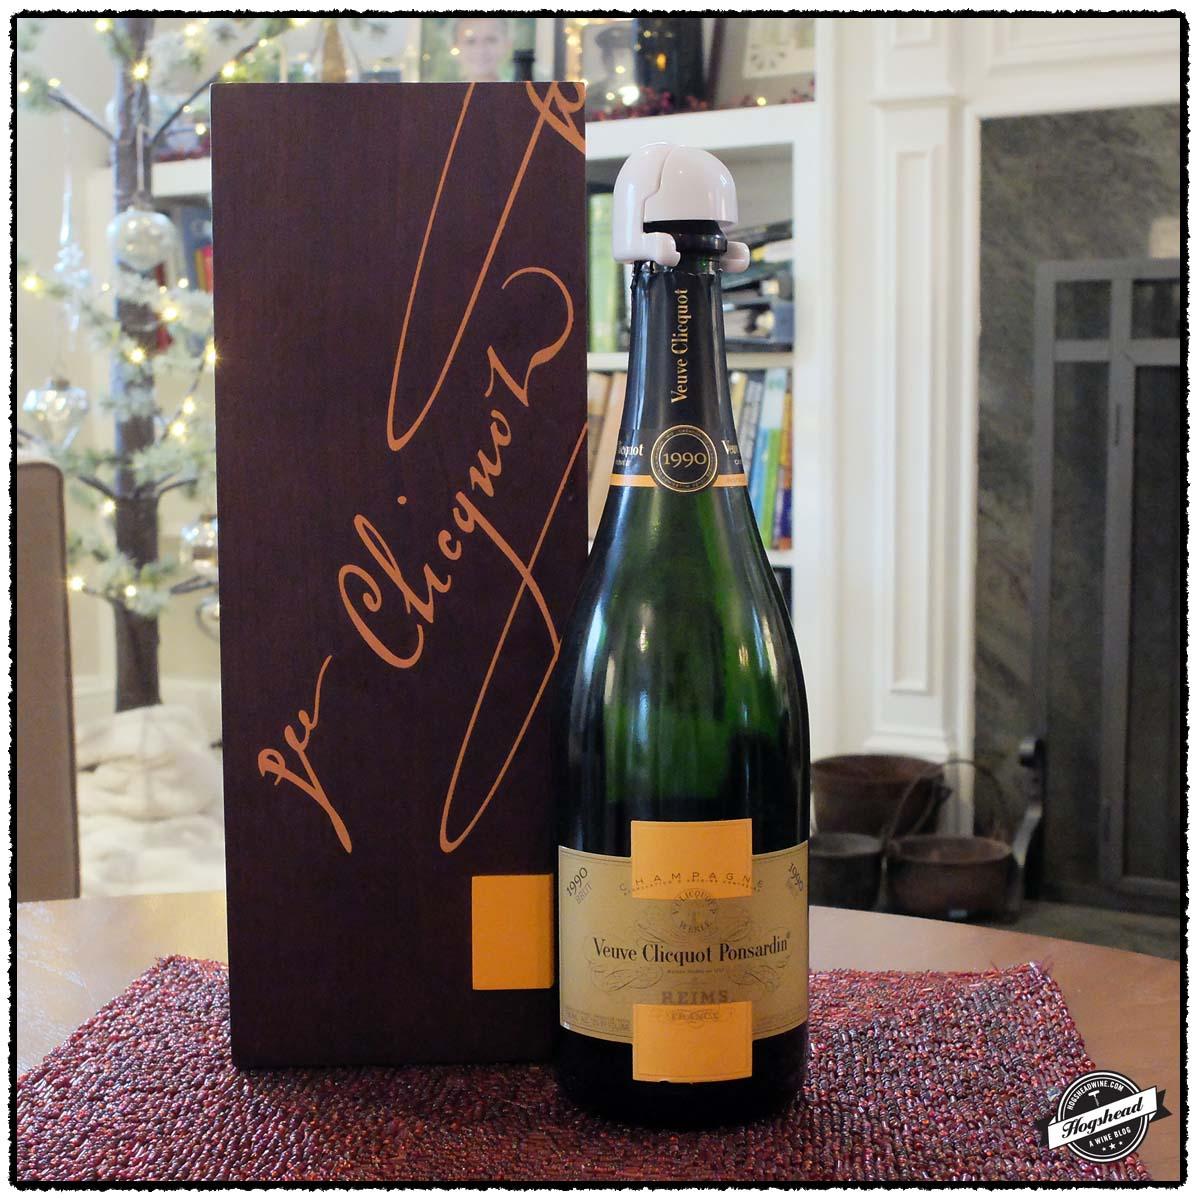 Capsule de champagne Besserat De Bellefon N° 23 rare Verzamelingen Doppen